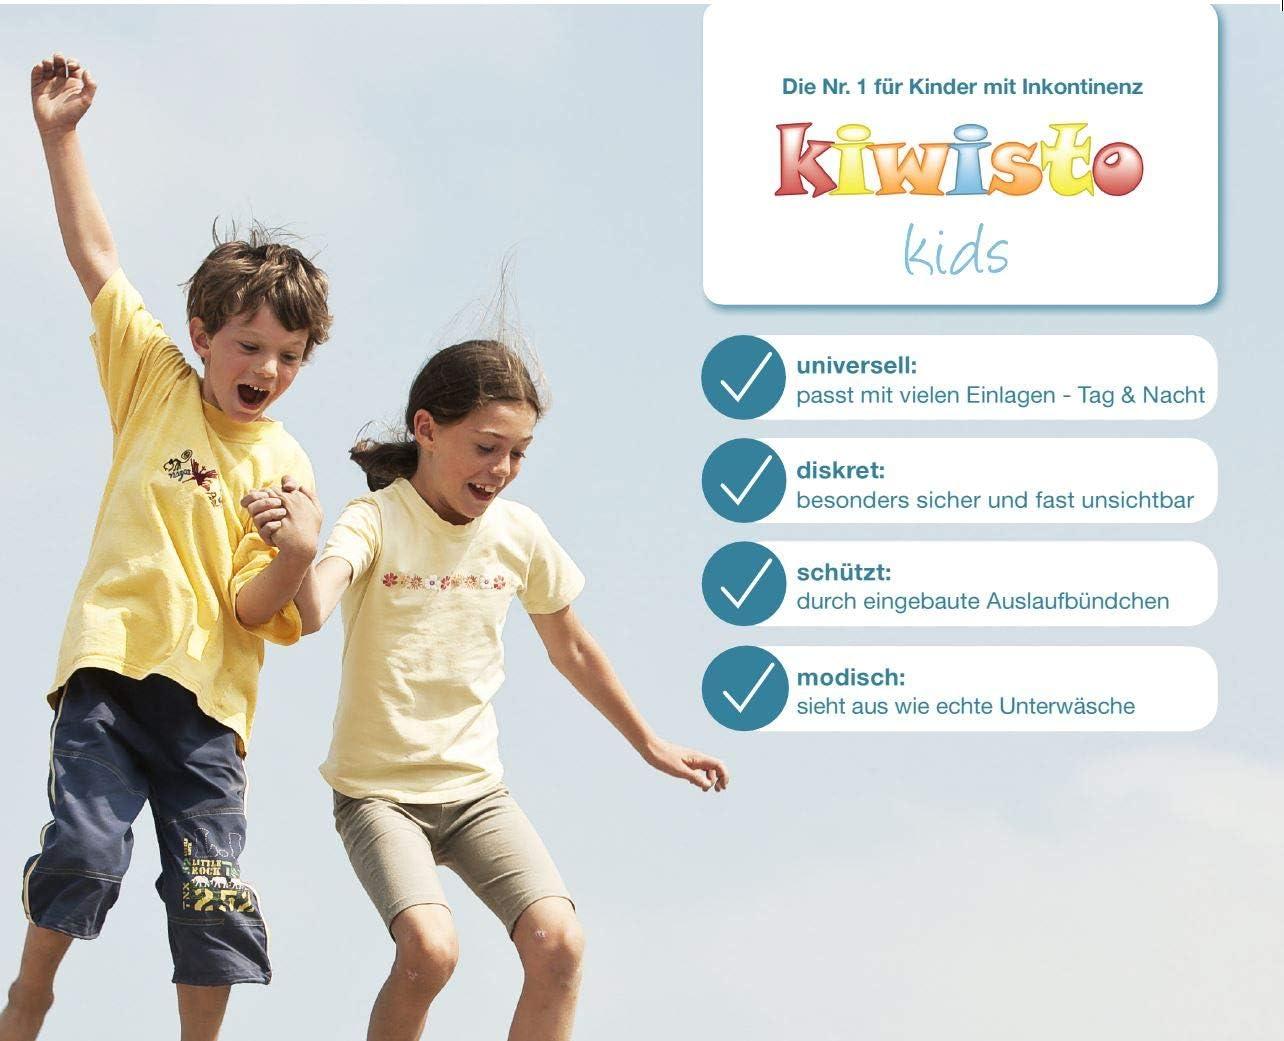 110//116 3XS - Inkontinenz-Schutzhose f/ür Kinder grau kiwisto Kids ActivePants